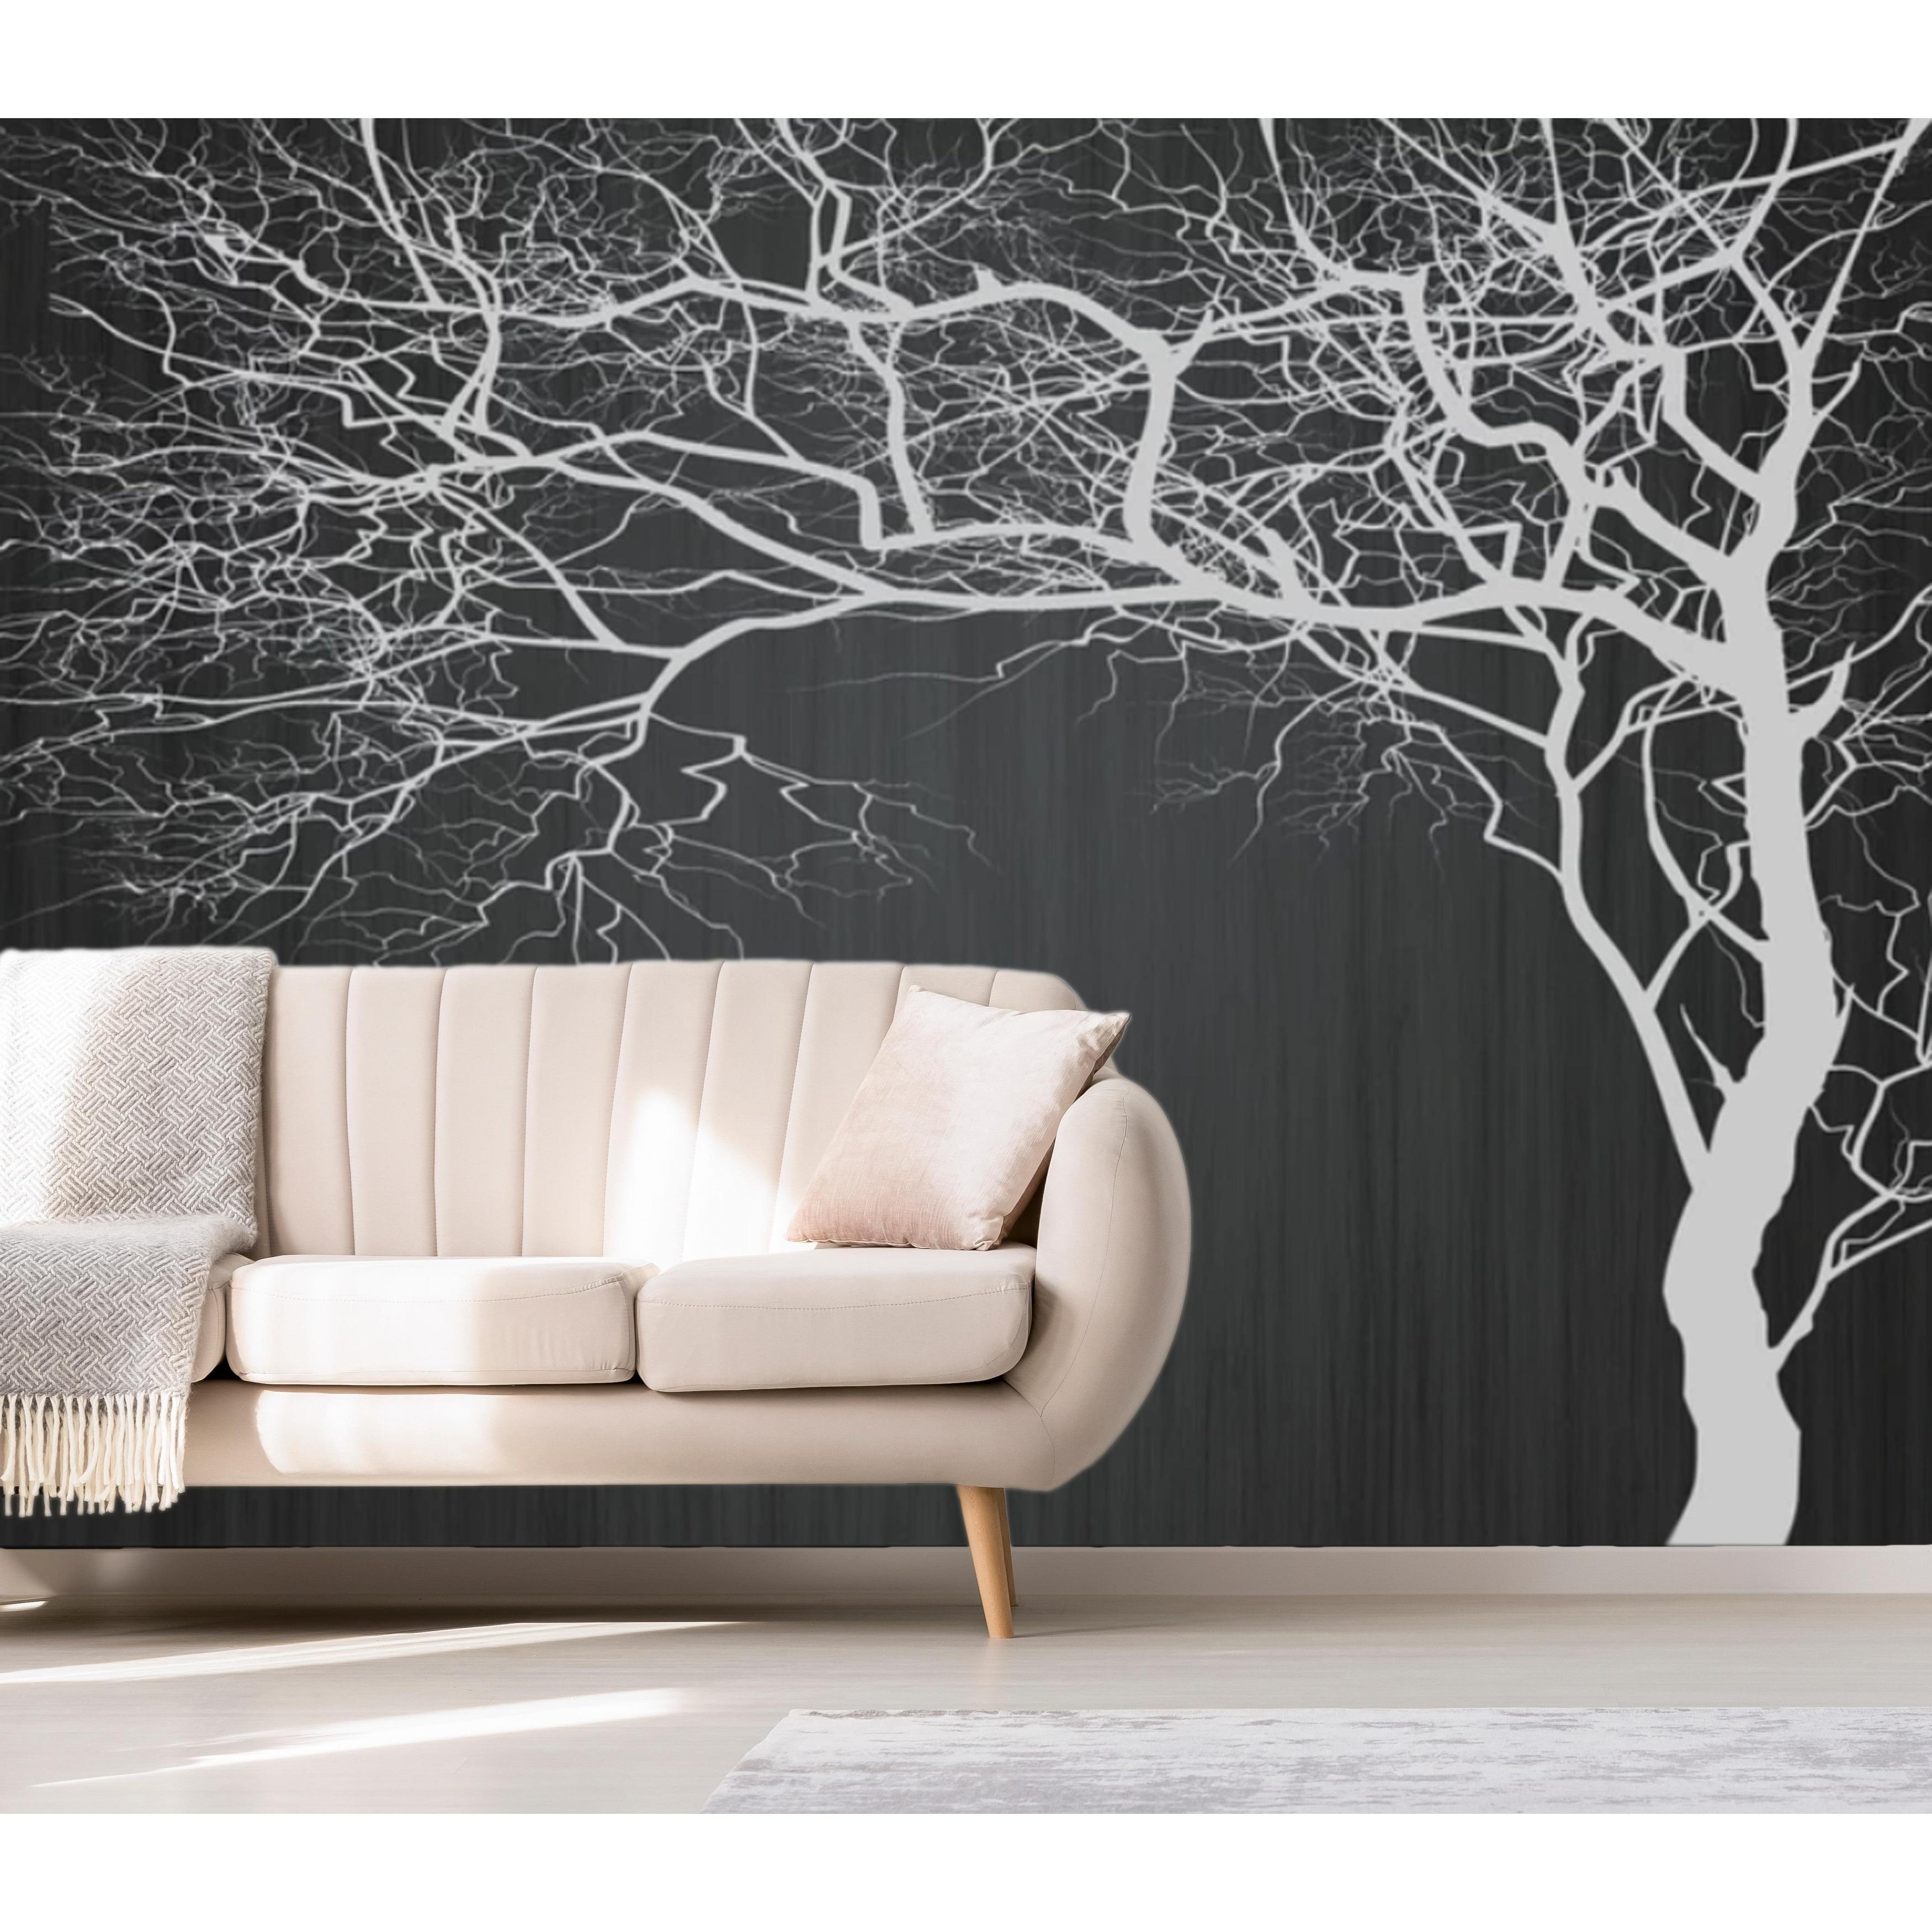 Monochrome Abstract Minimalist Trees Textile Wallpaper Overstock 31419713